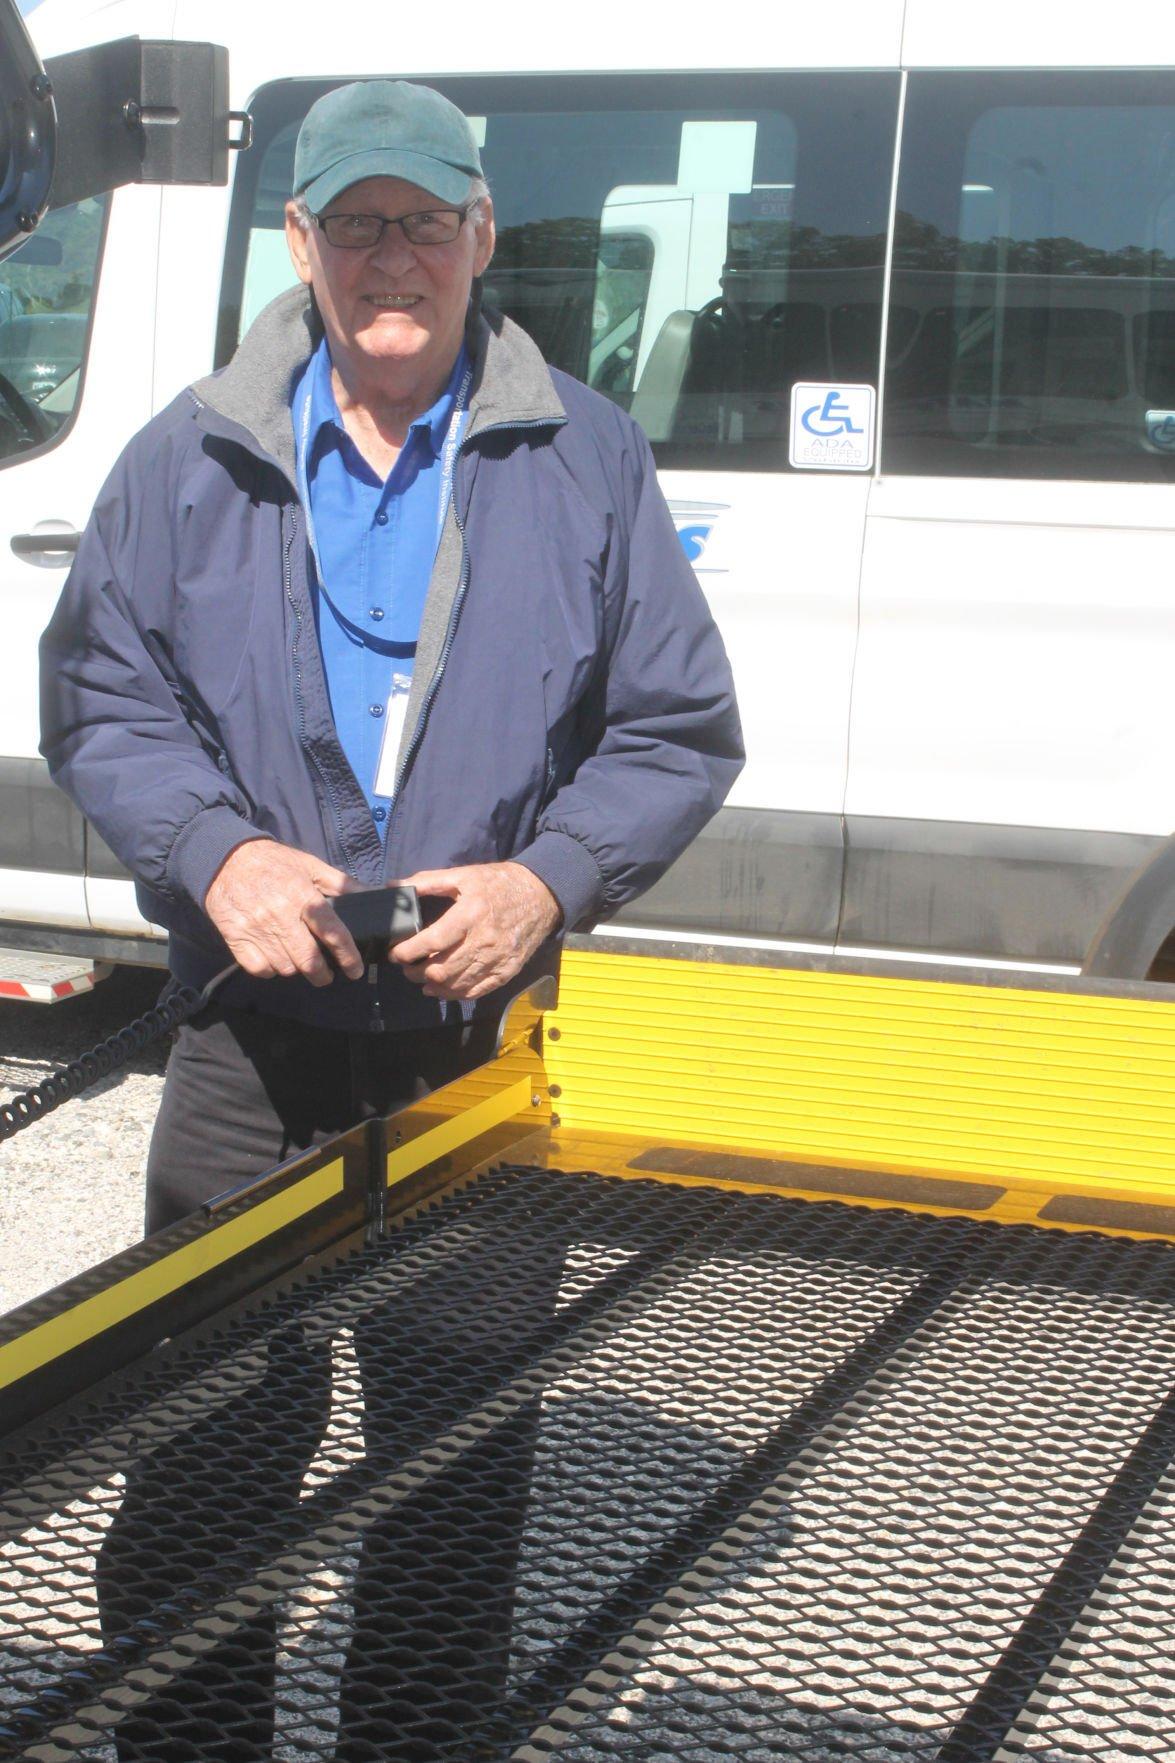 transit driver